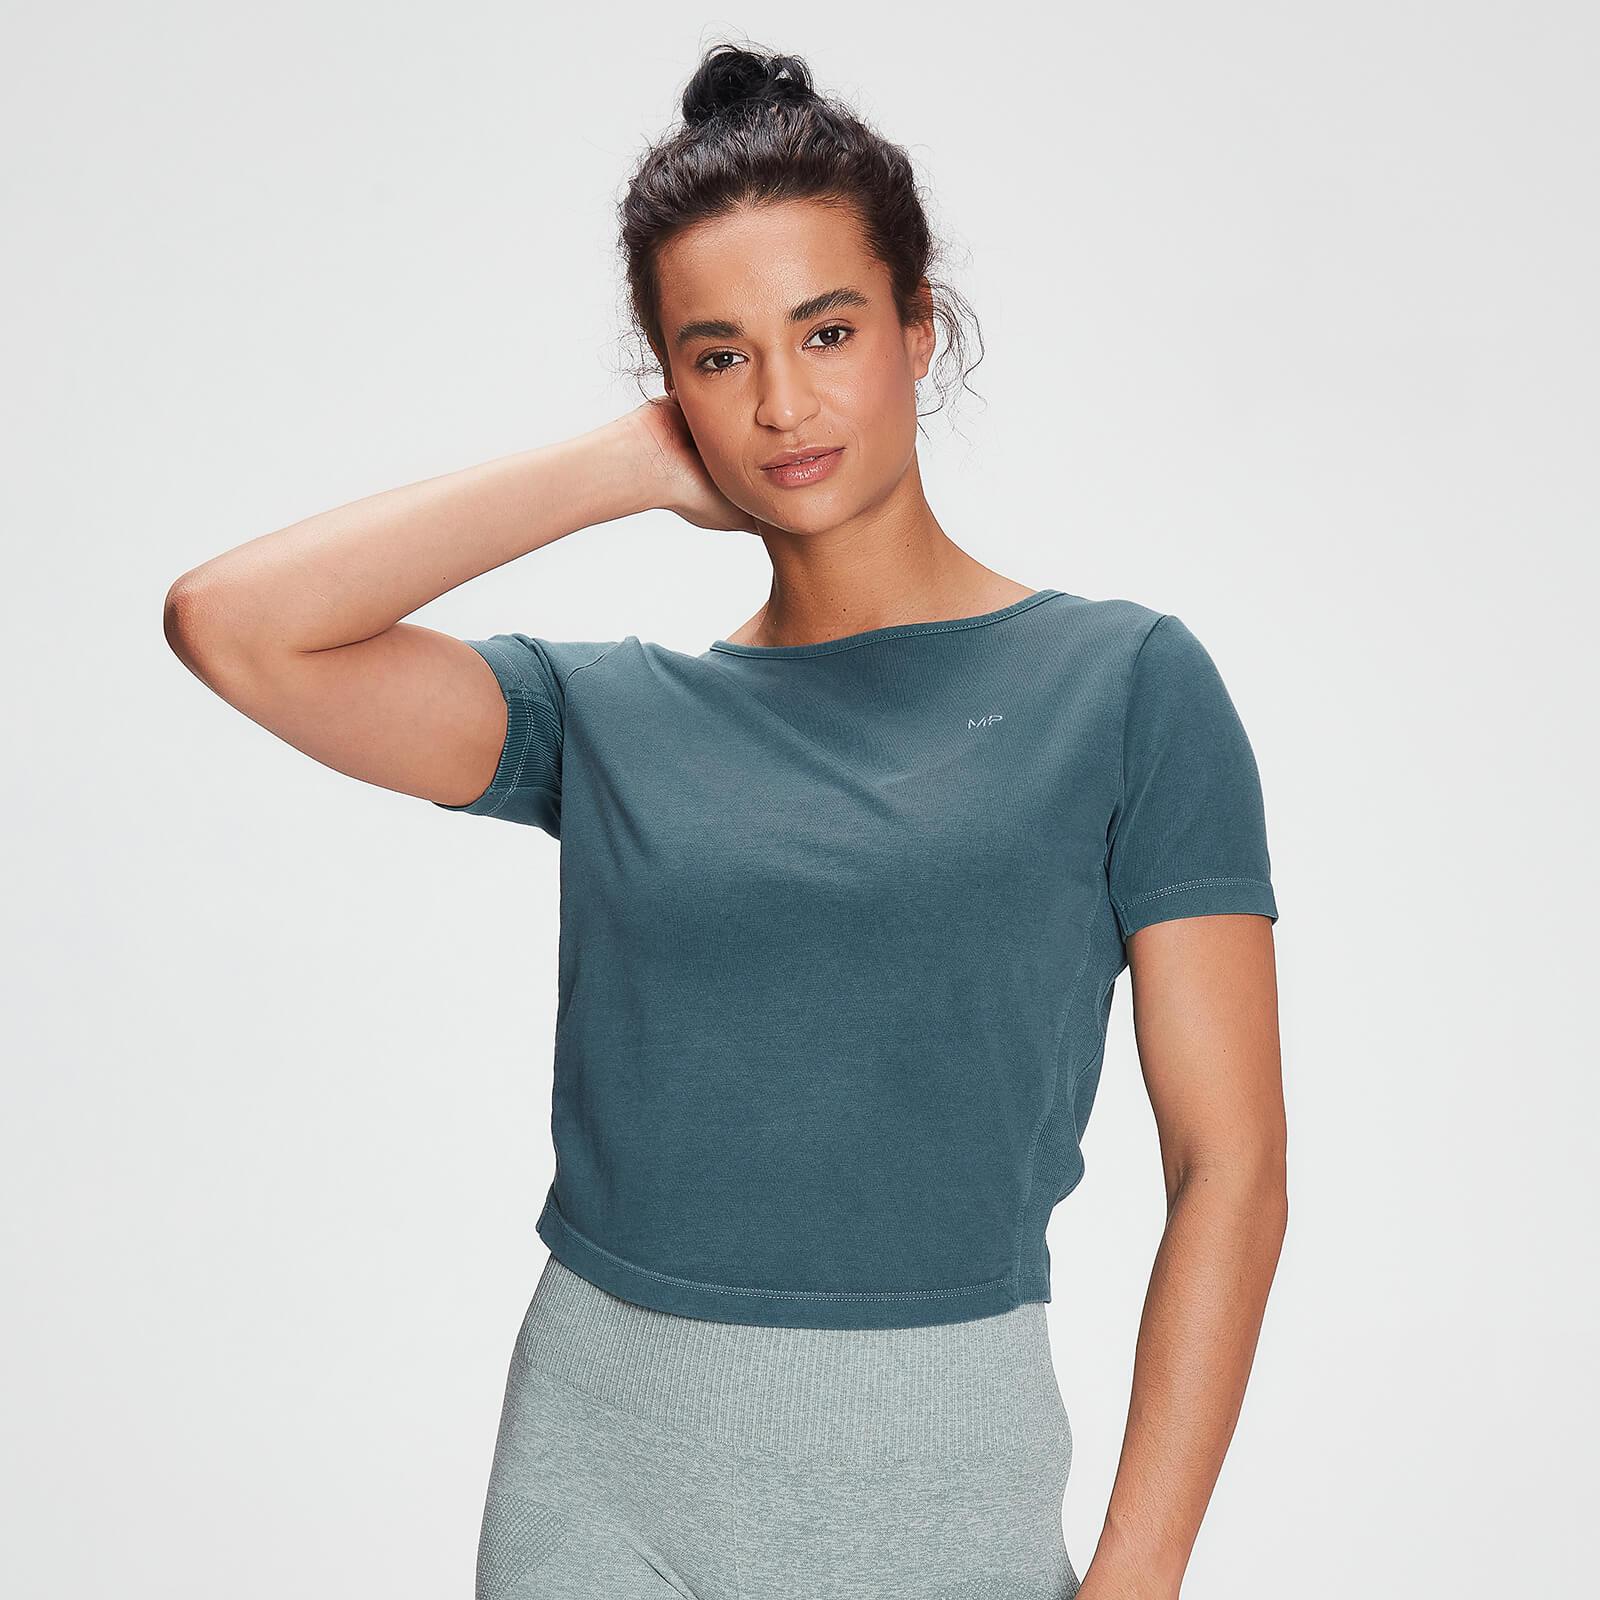 MP Womens Raw Training Washed Tie Back T-shirt - Deep Sea Blue - XS